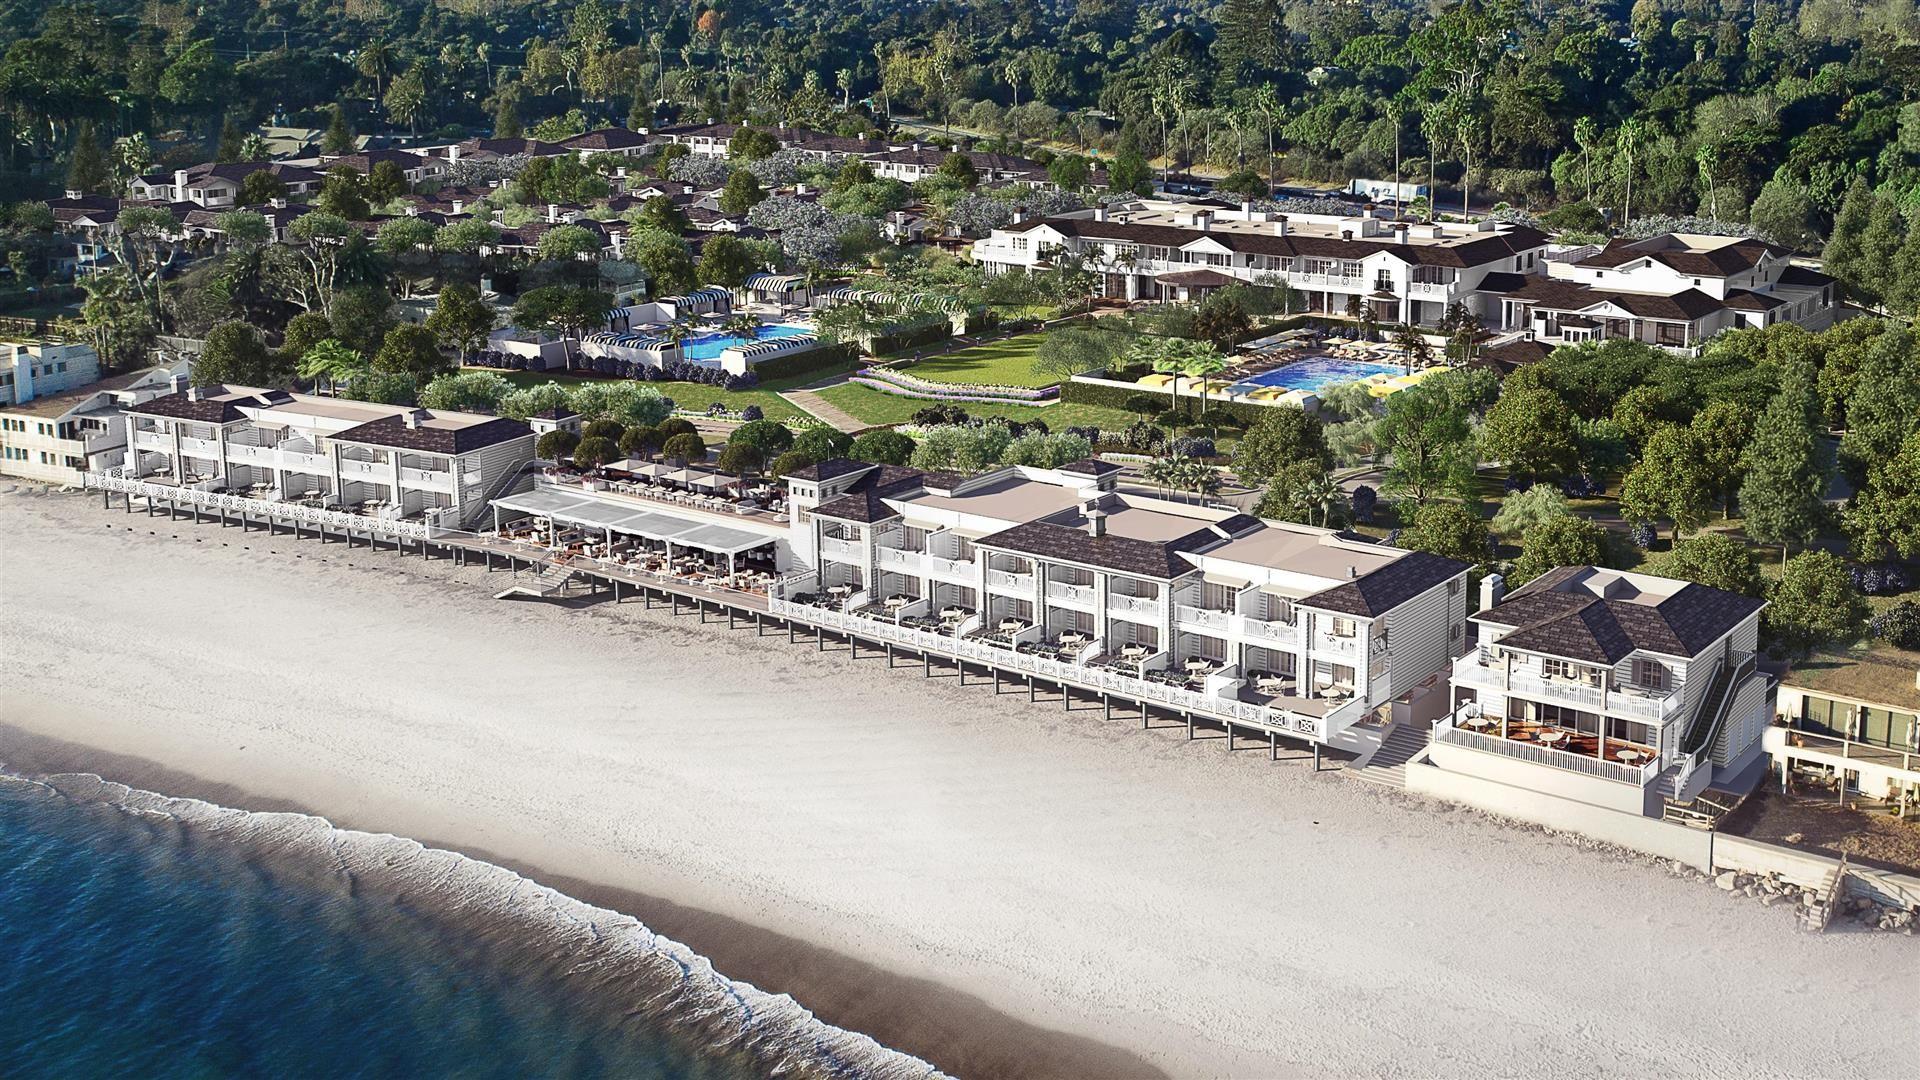 Hotel Opening Q1 2019 Rosewood Miramar Beach Hotel Montecito